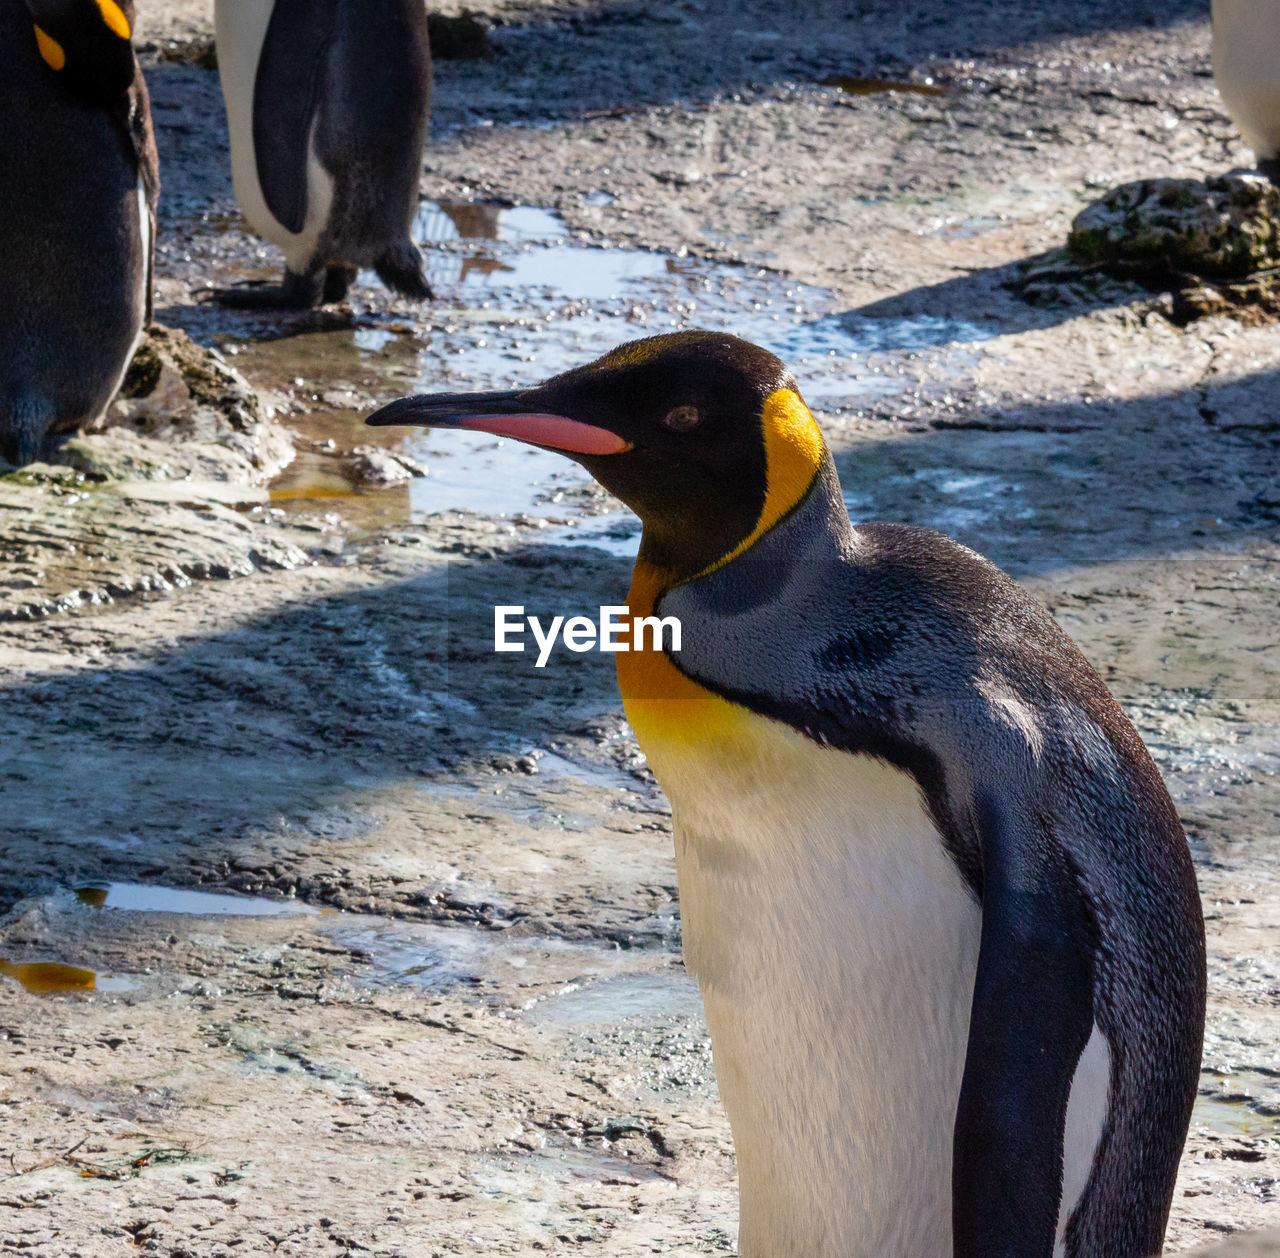 animal, animal themes, vertebrate, animal wildlife, bird, animals in the wild, penguin, one animal, nature, day, water, beak, close-up, no people, focus on foreground, beach, solid, sunlight, animal head